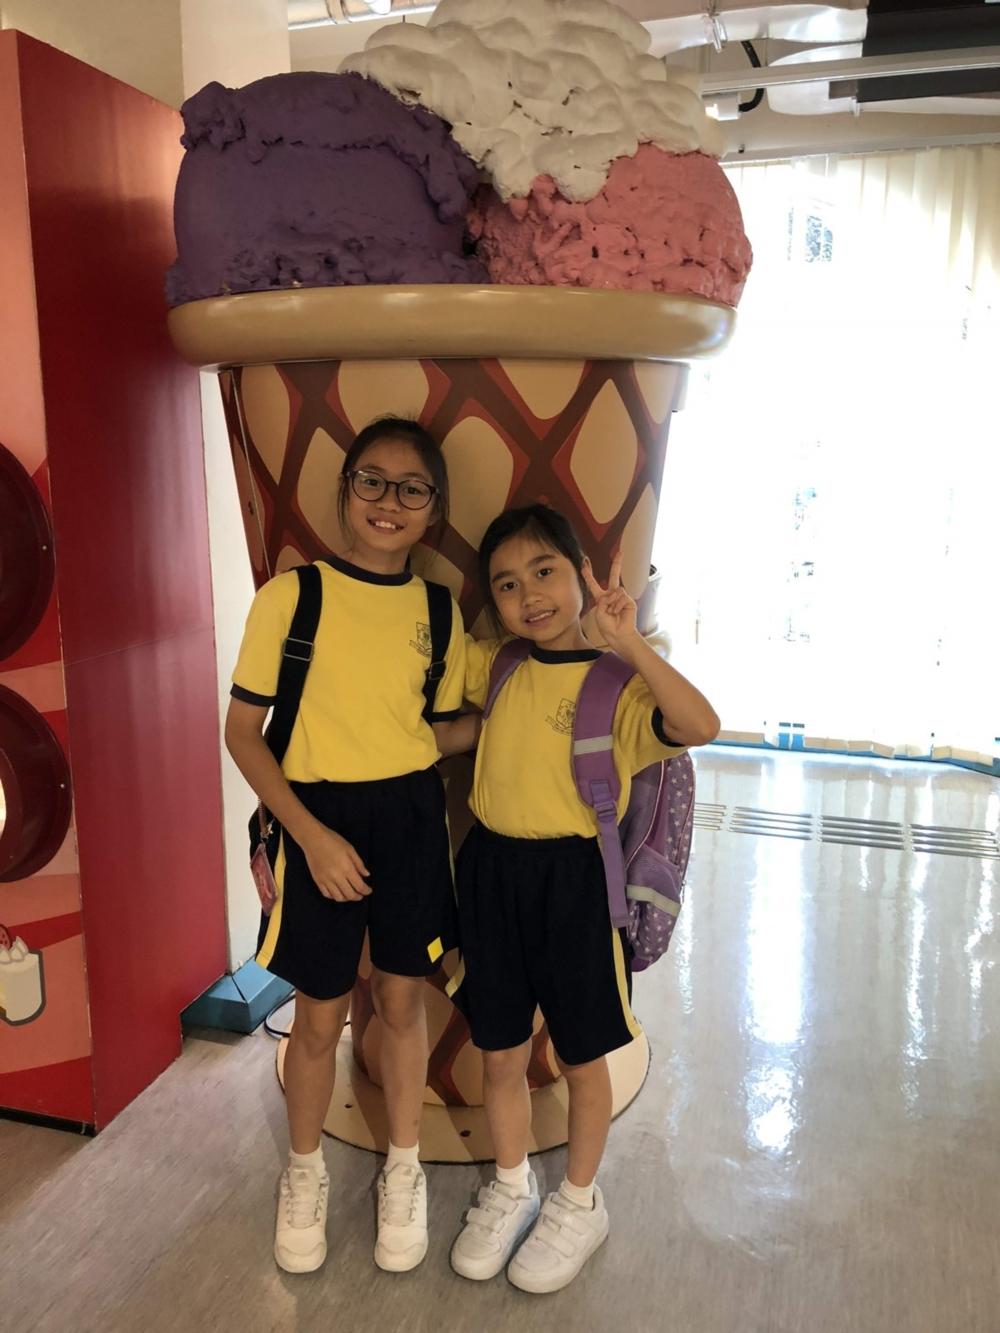 http://pohckwps.edu.hk/sites/default/files/44_9.jpg